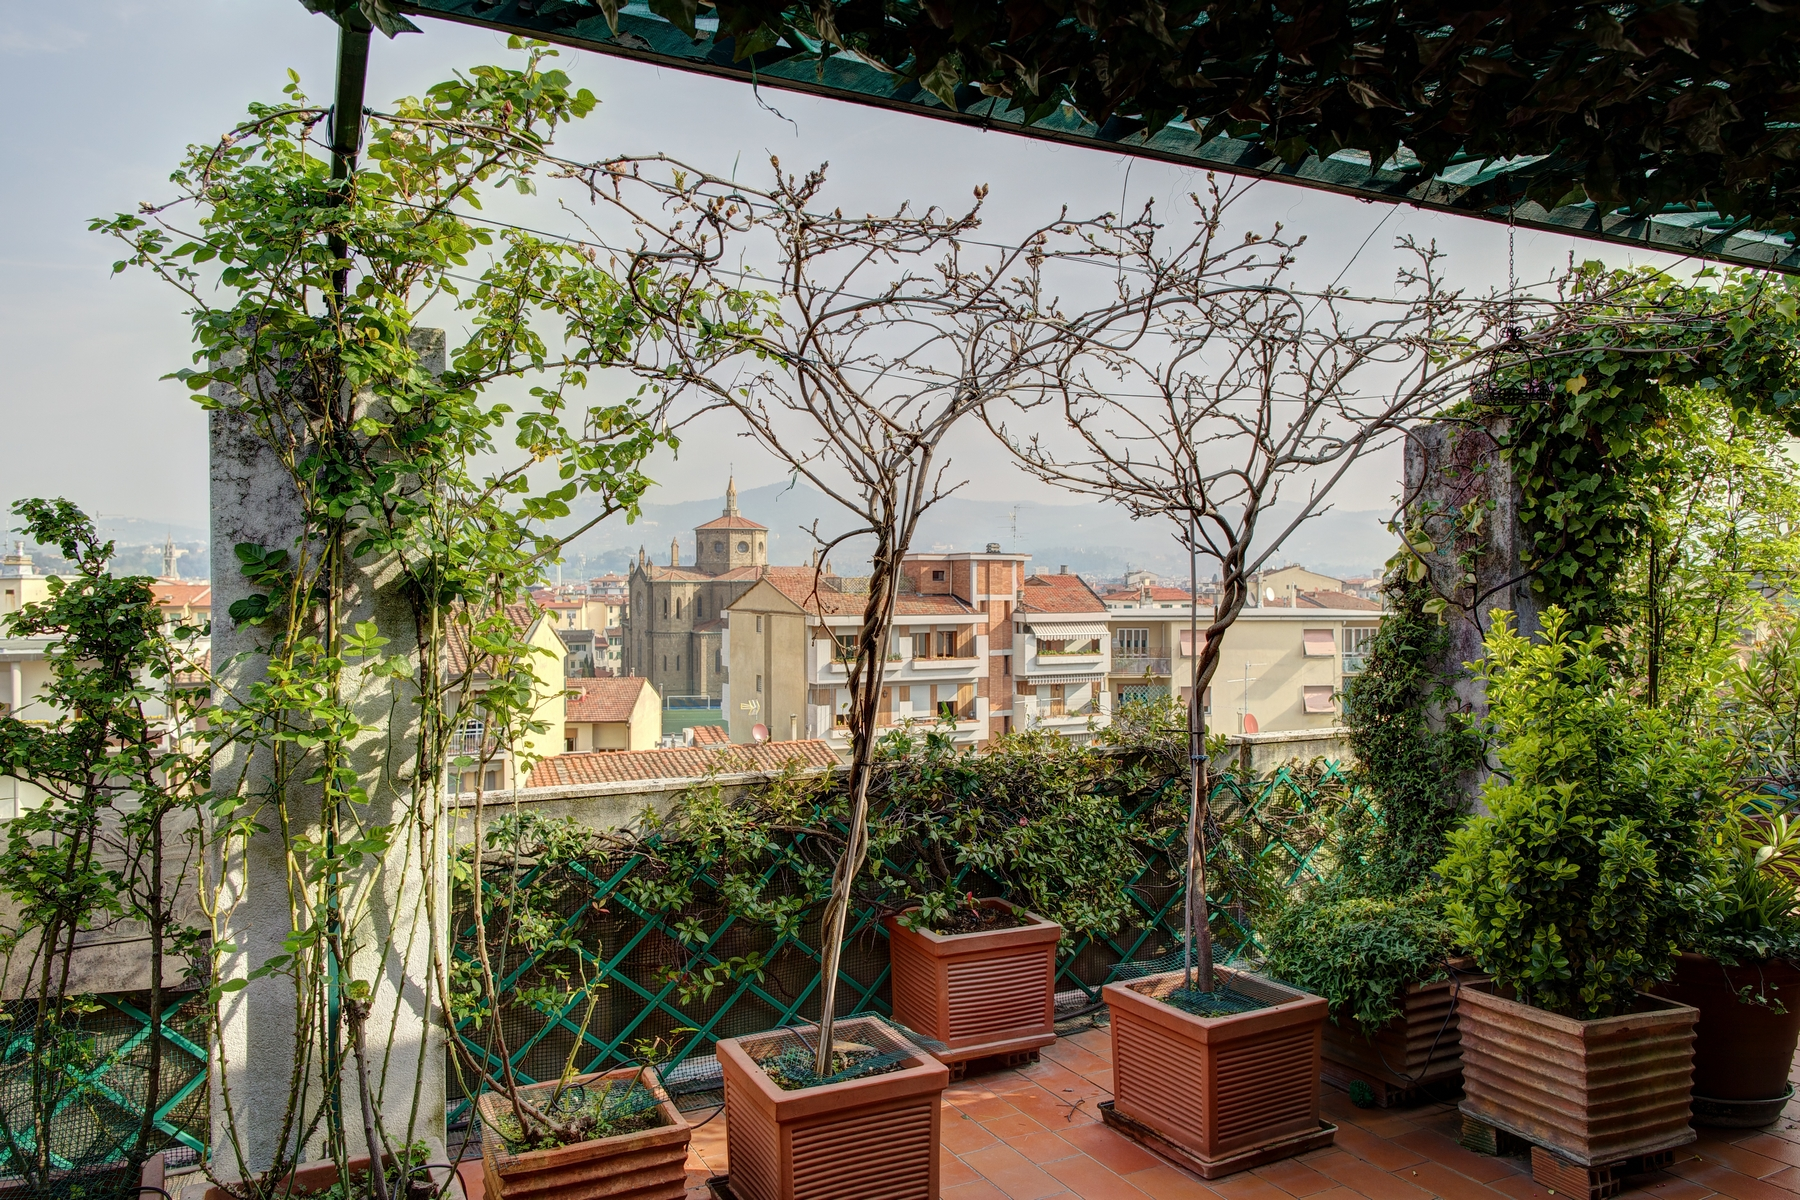 Attico in Vendita a Firenze: 5 locali, 130 mq - Foto 9